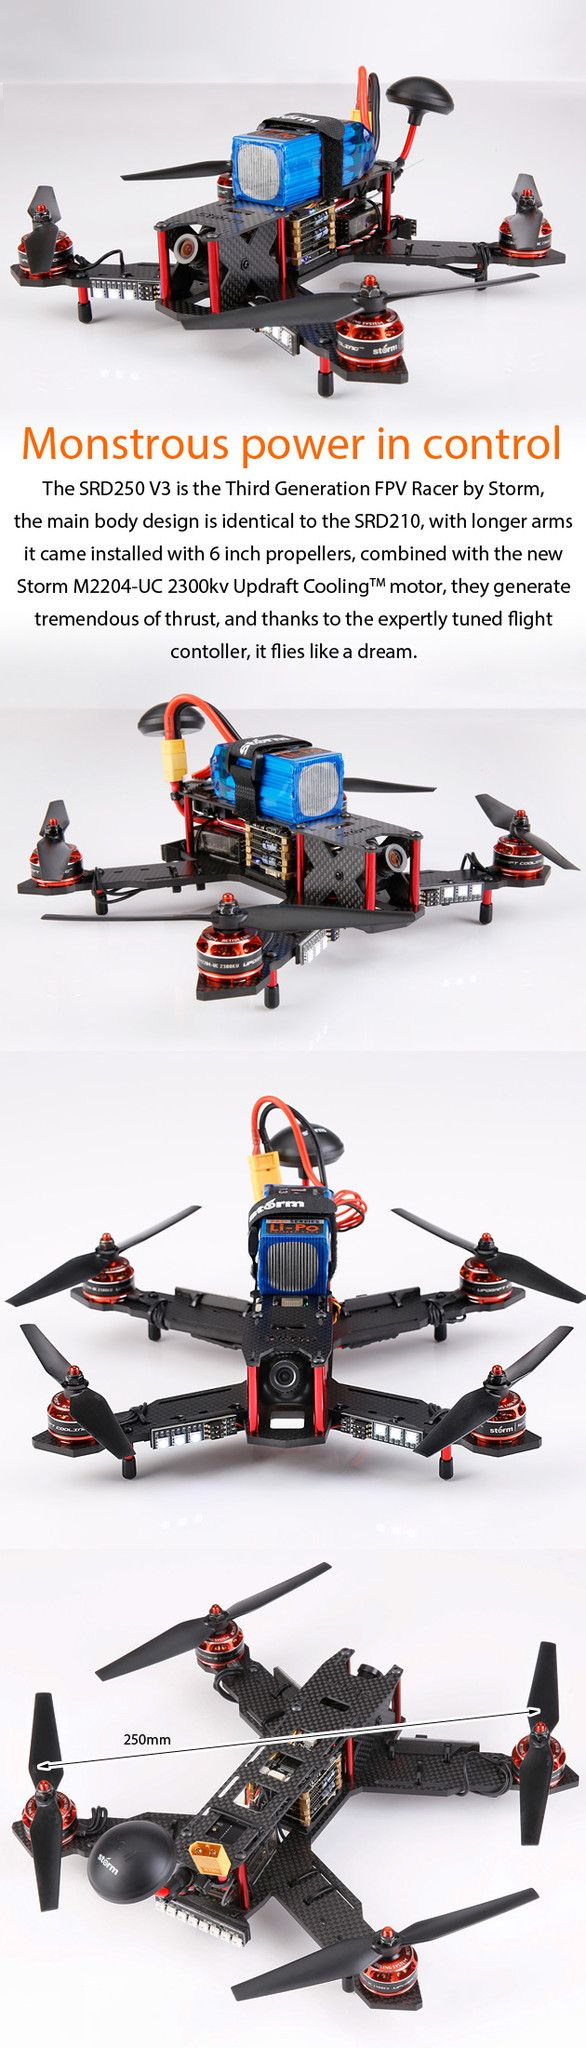 STORM Racing Drone (RTF / SRD250 V3 / TBS PowerCube)